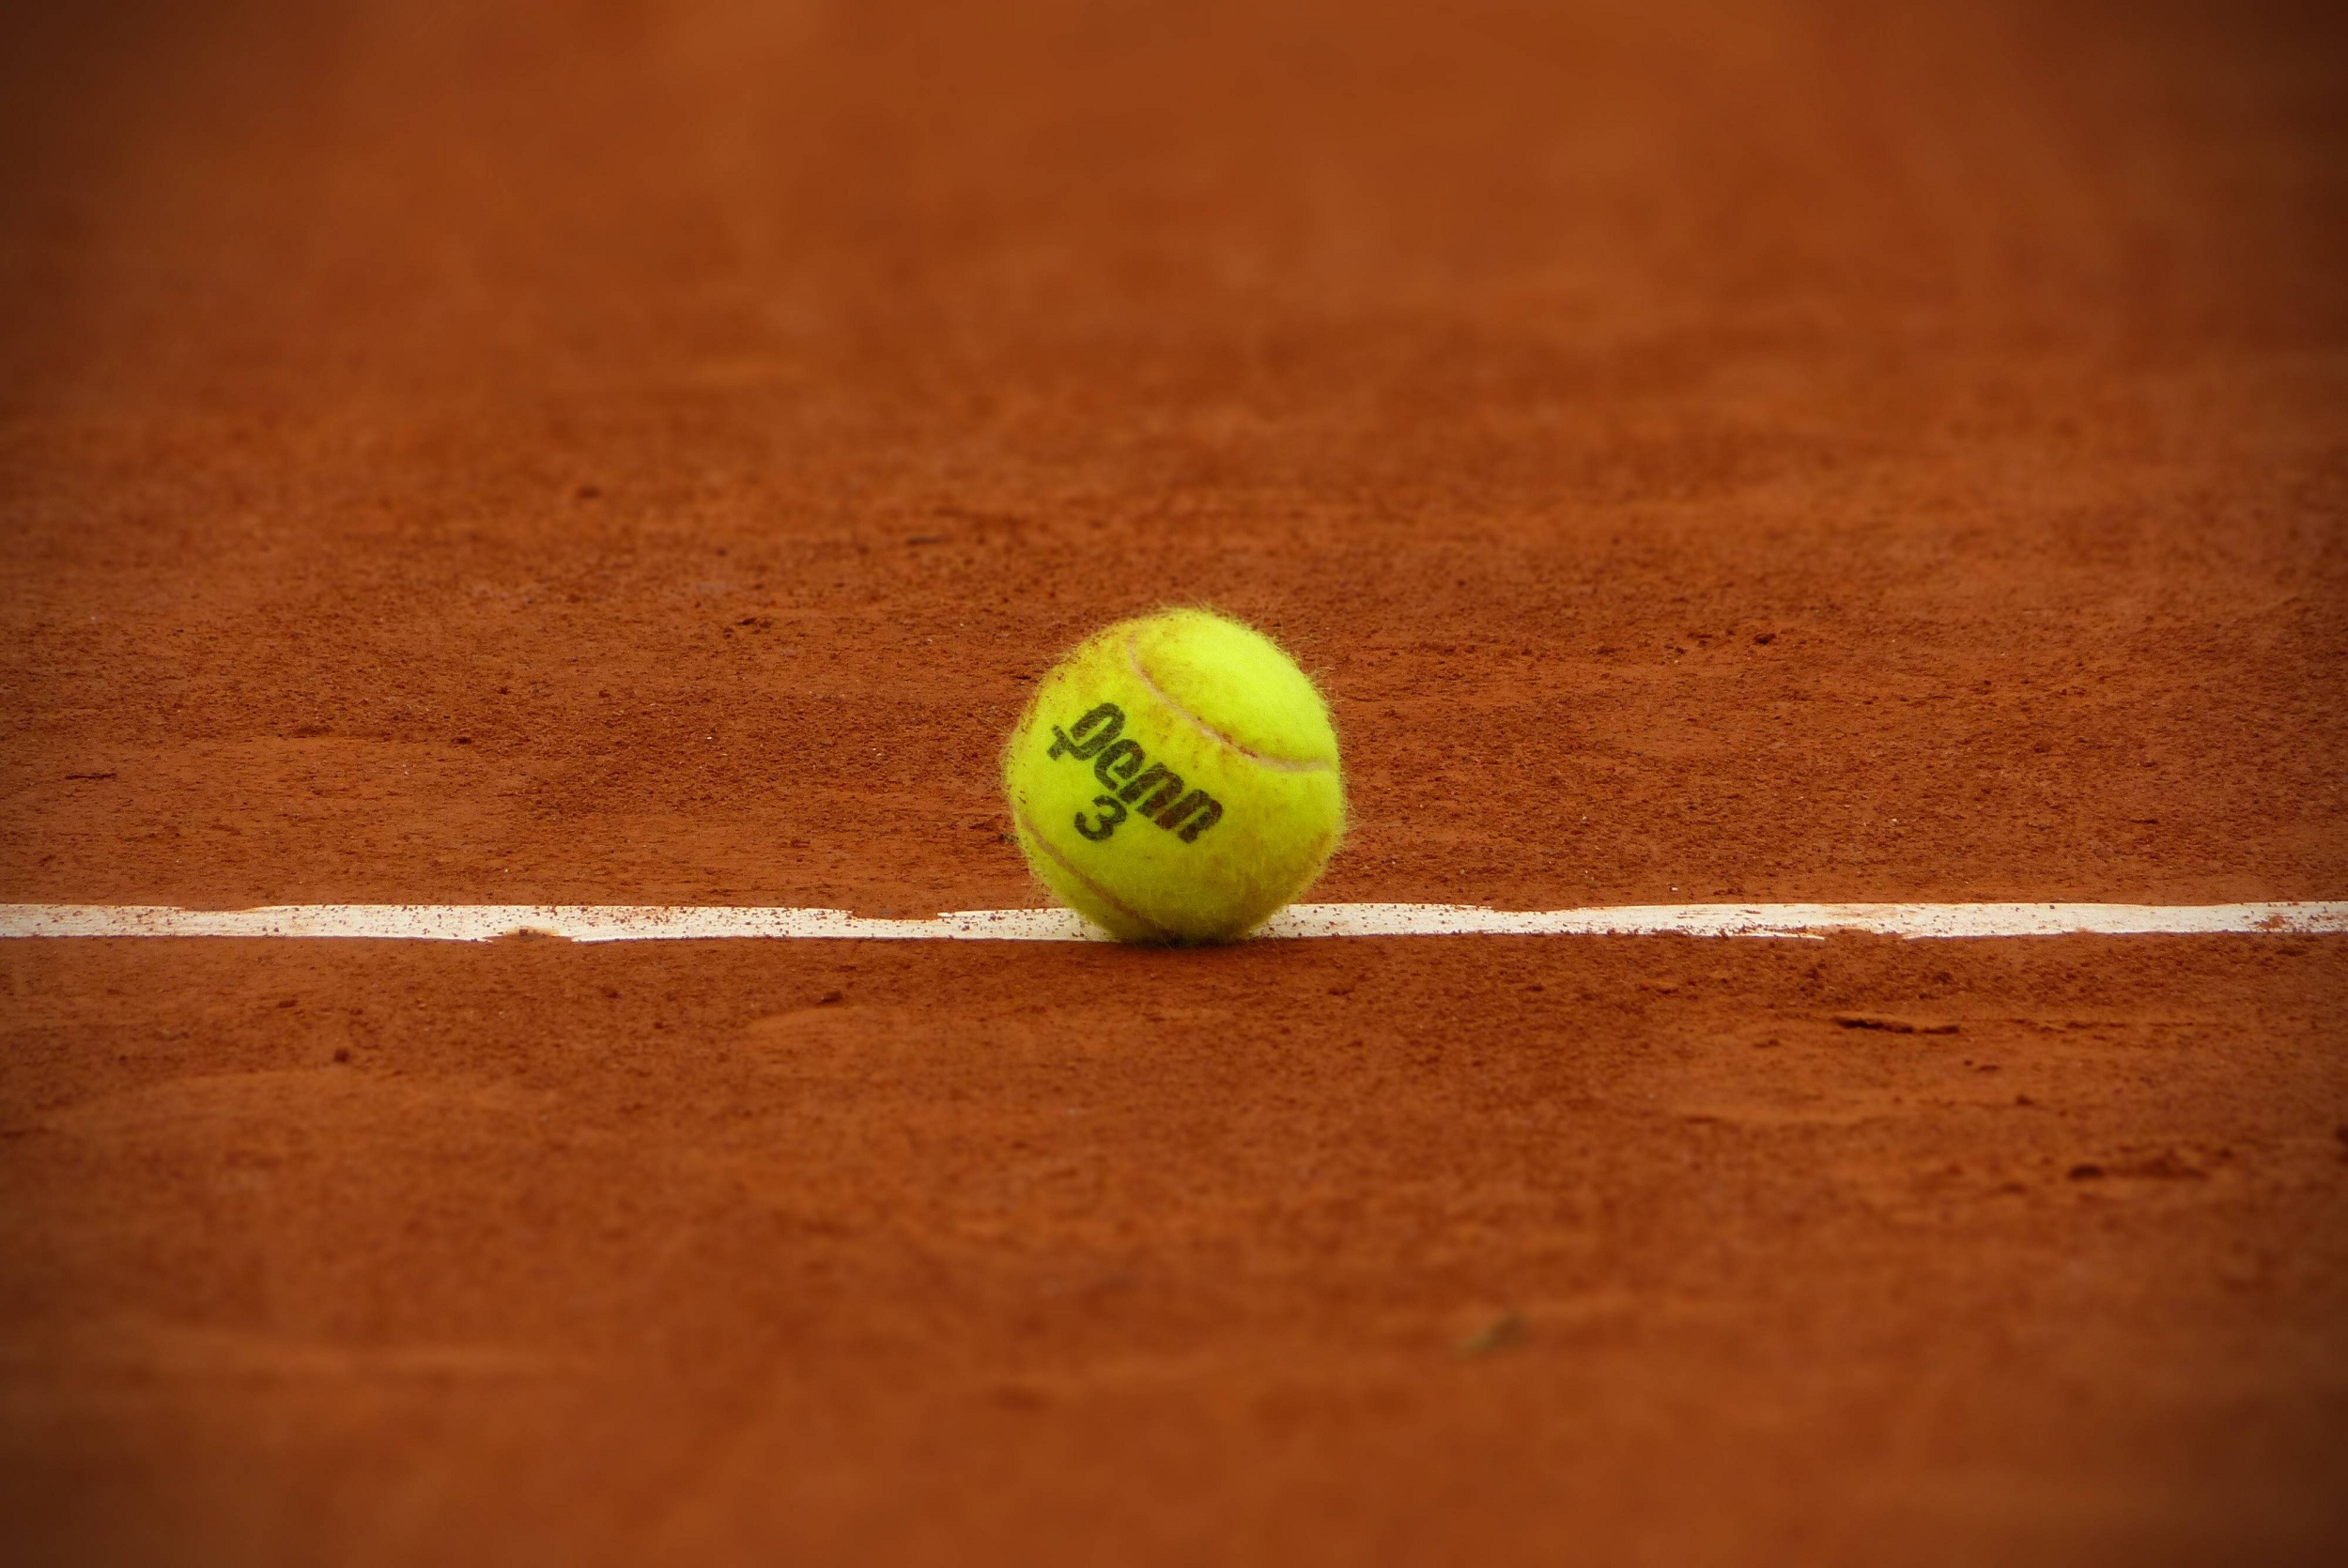 tennis screensavers